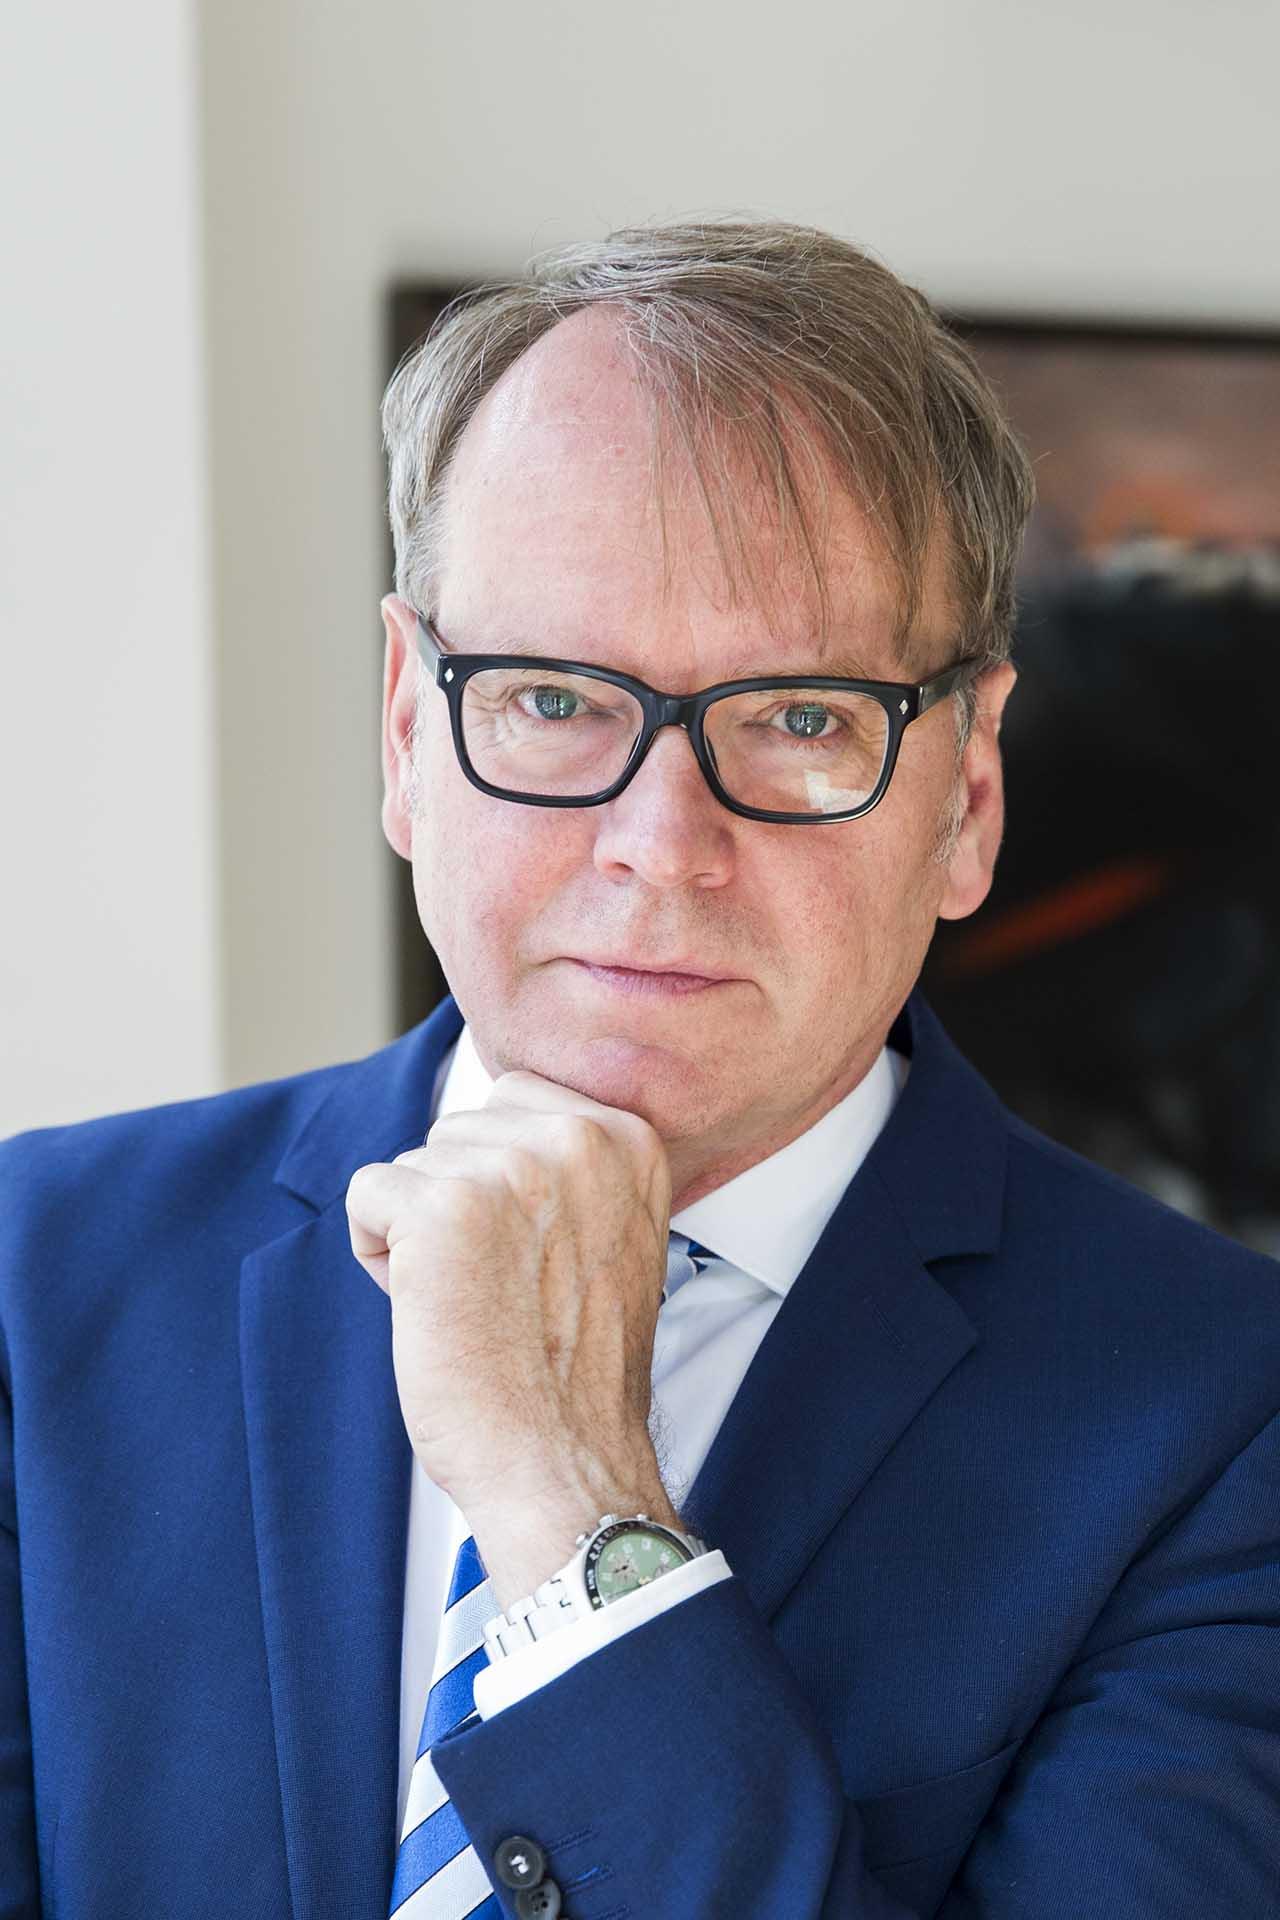 Rechtsanwalt Peter Seidel